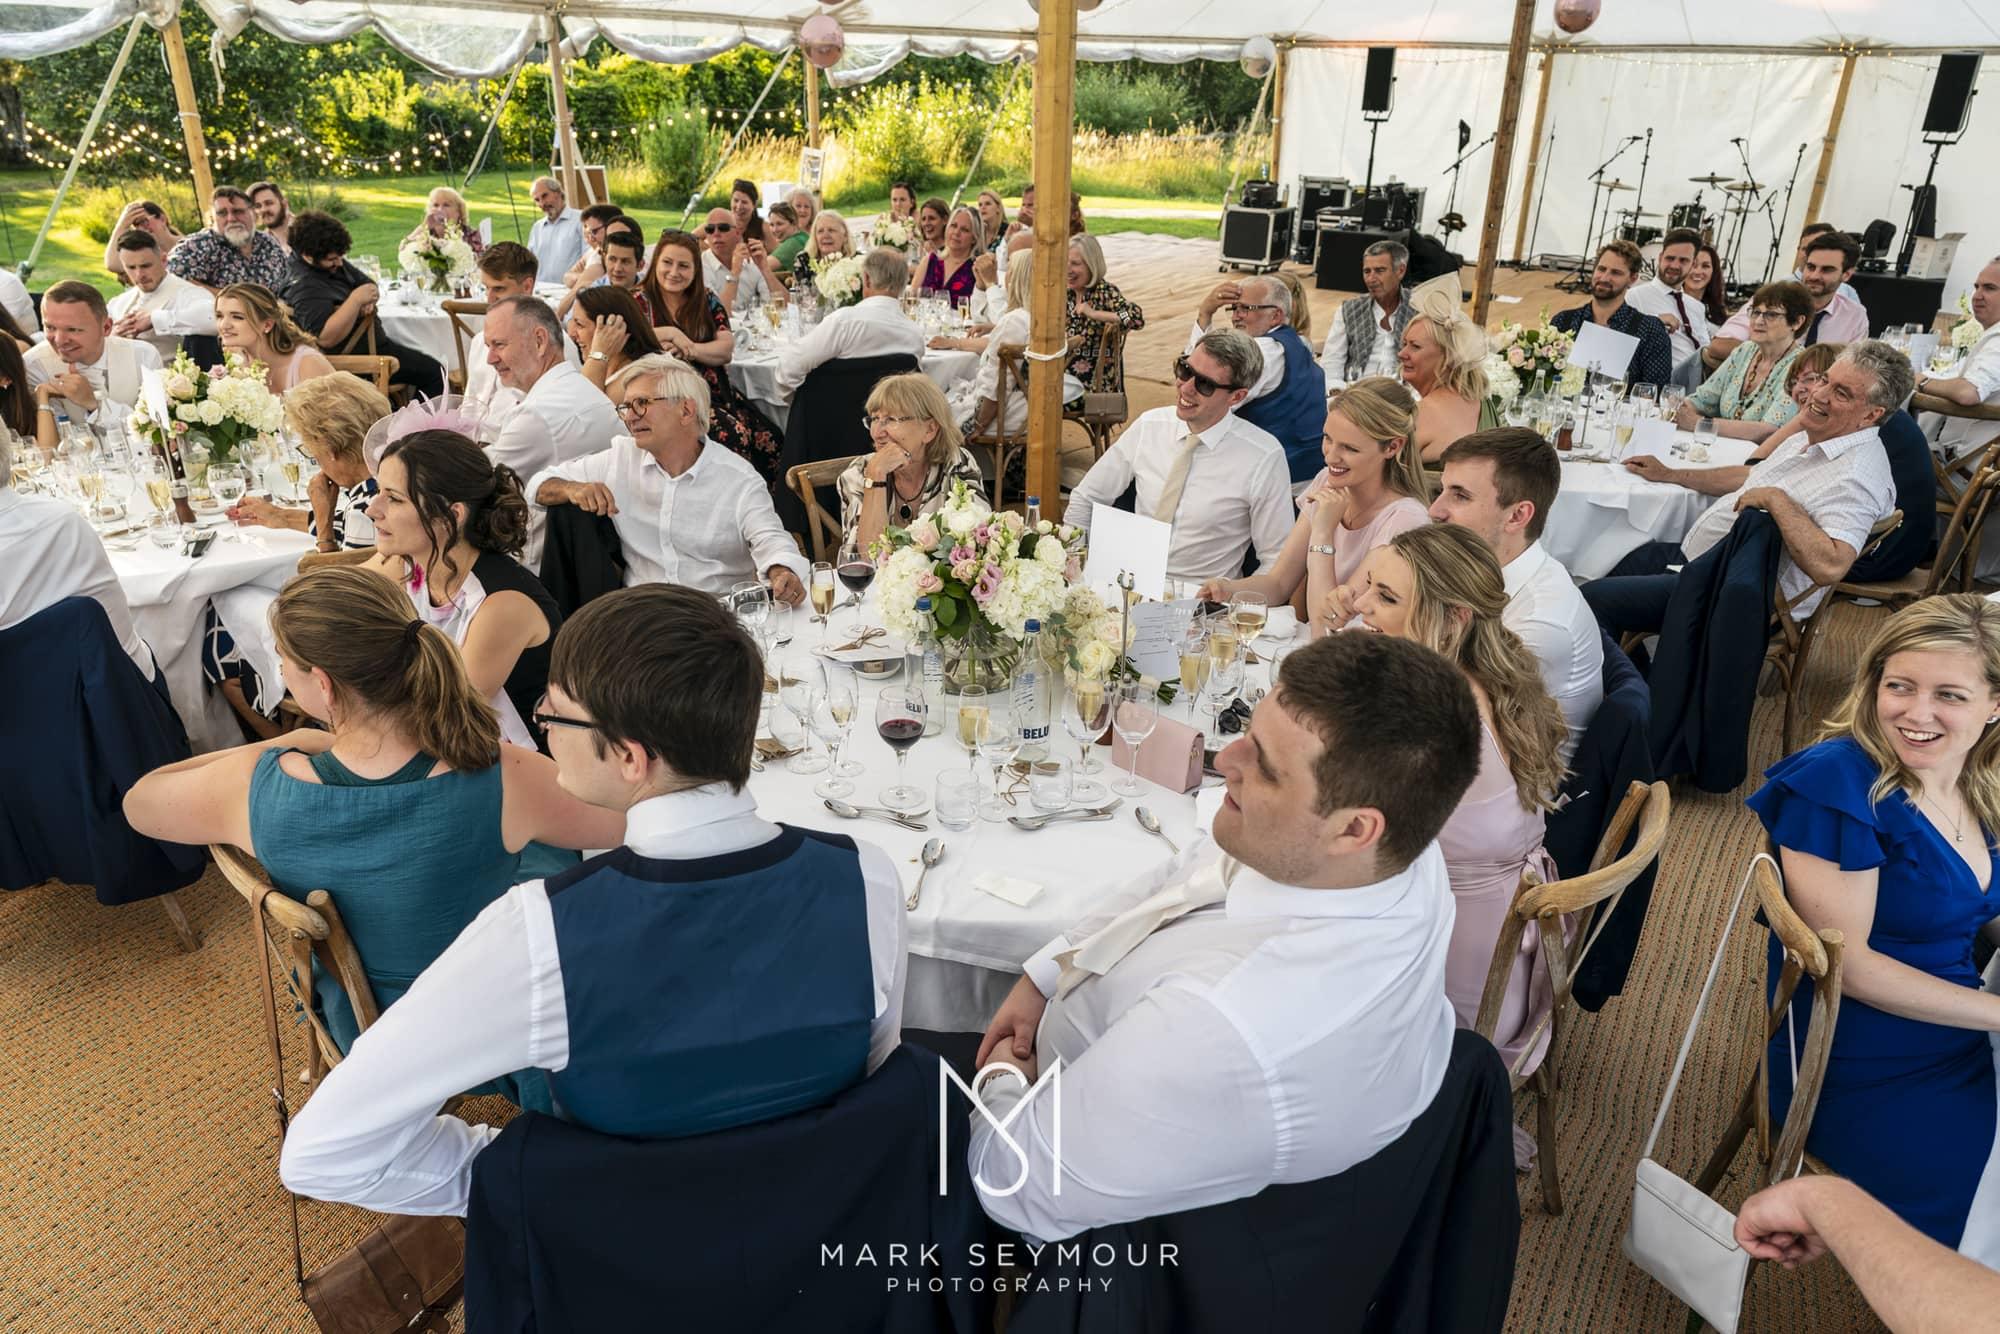 Barnsley House Wedding Photographer - Olivia and James' wedding 29